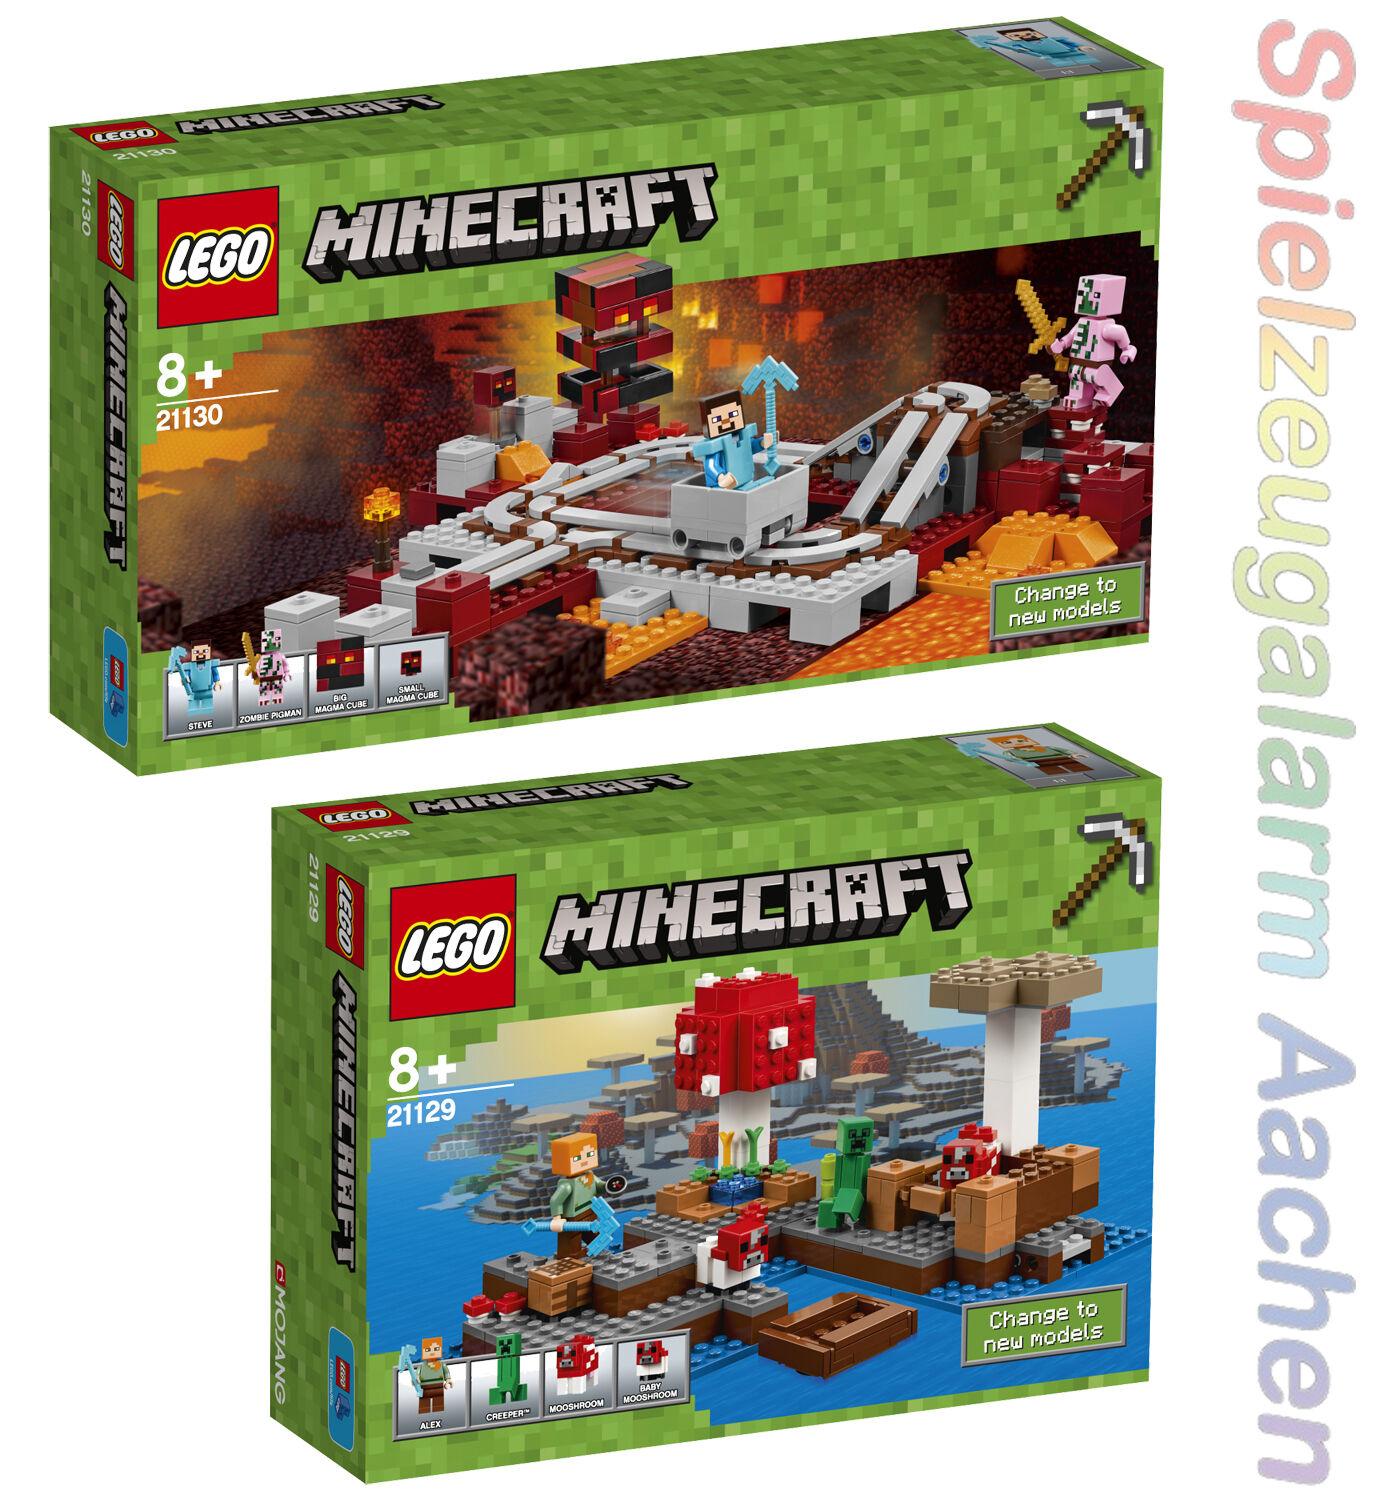 LEGO Minecraft 2Tlg Set 21129 21130 Die Pilzinsel Die Nether Nether Nether Eisenbahn Ale N5 17 8f32bf